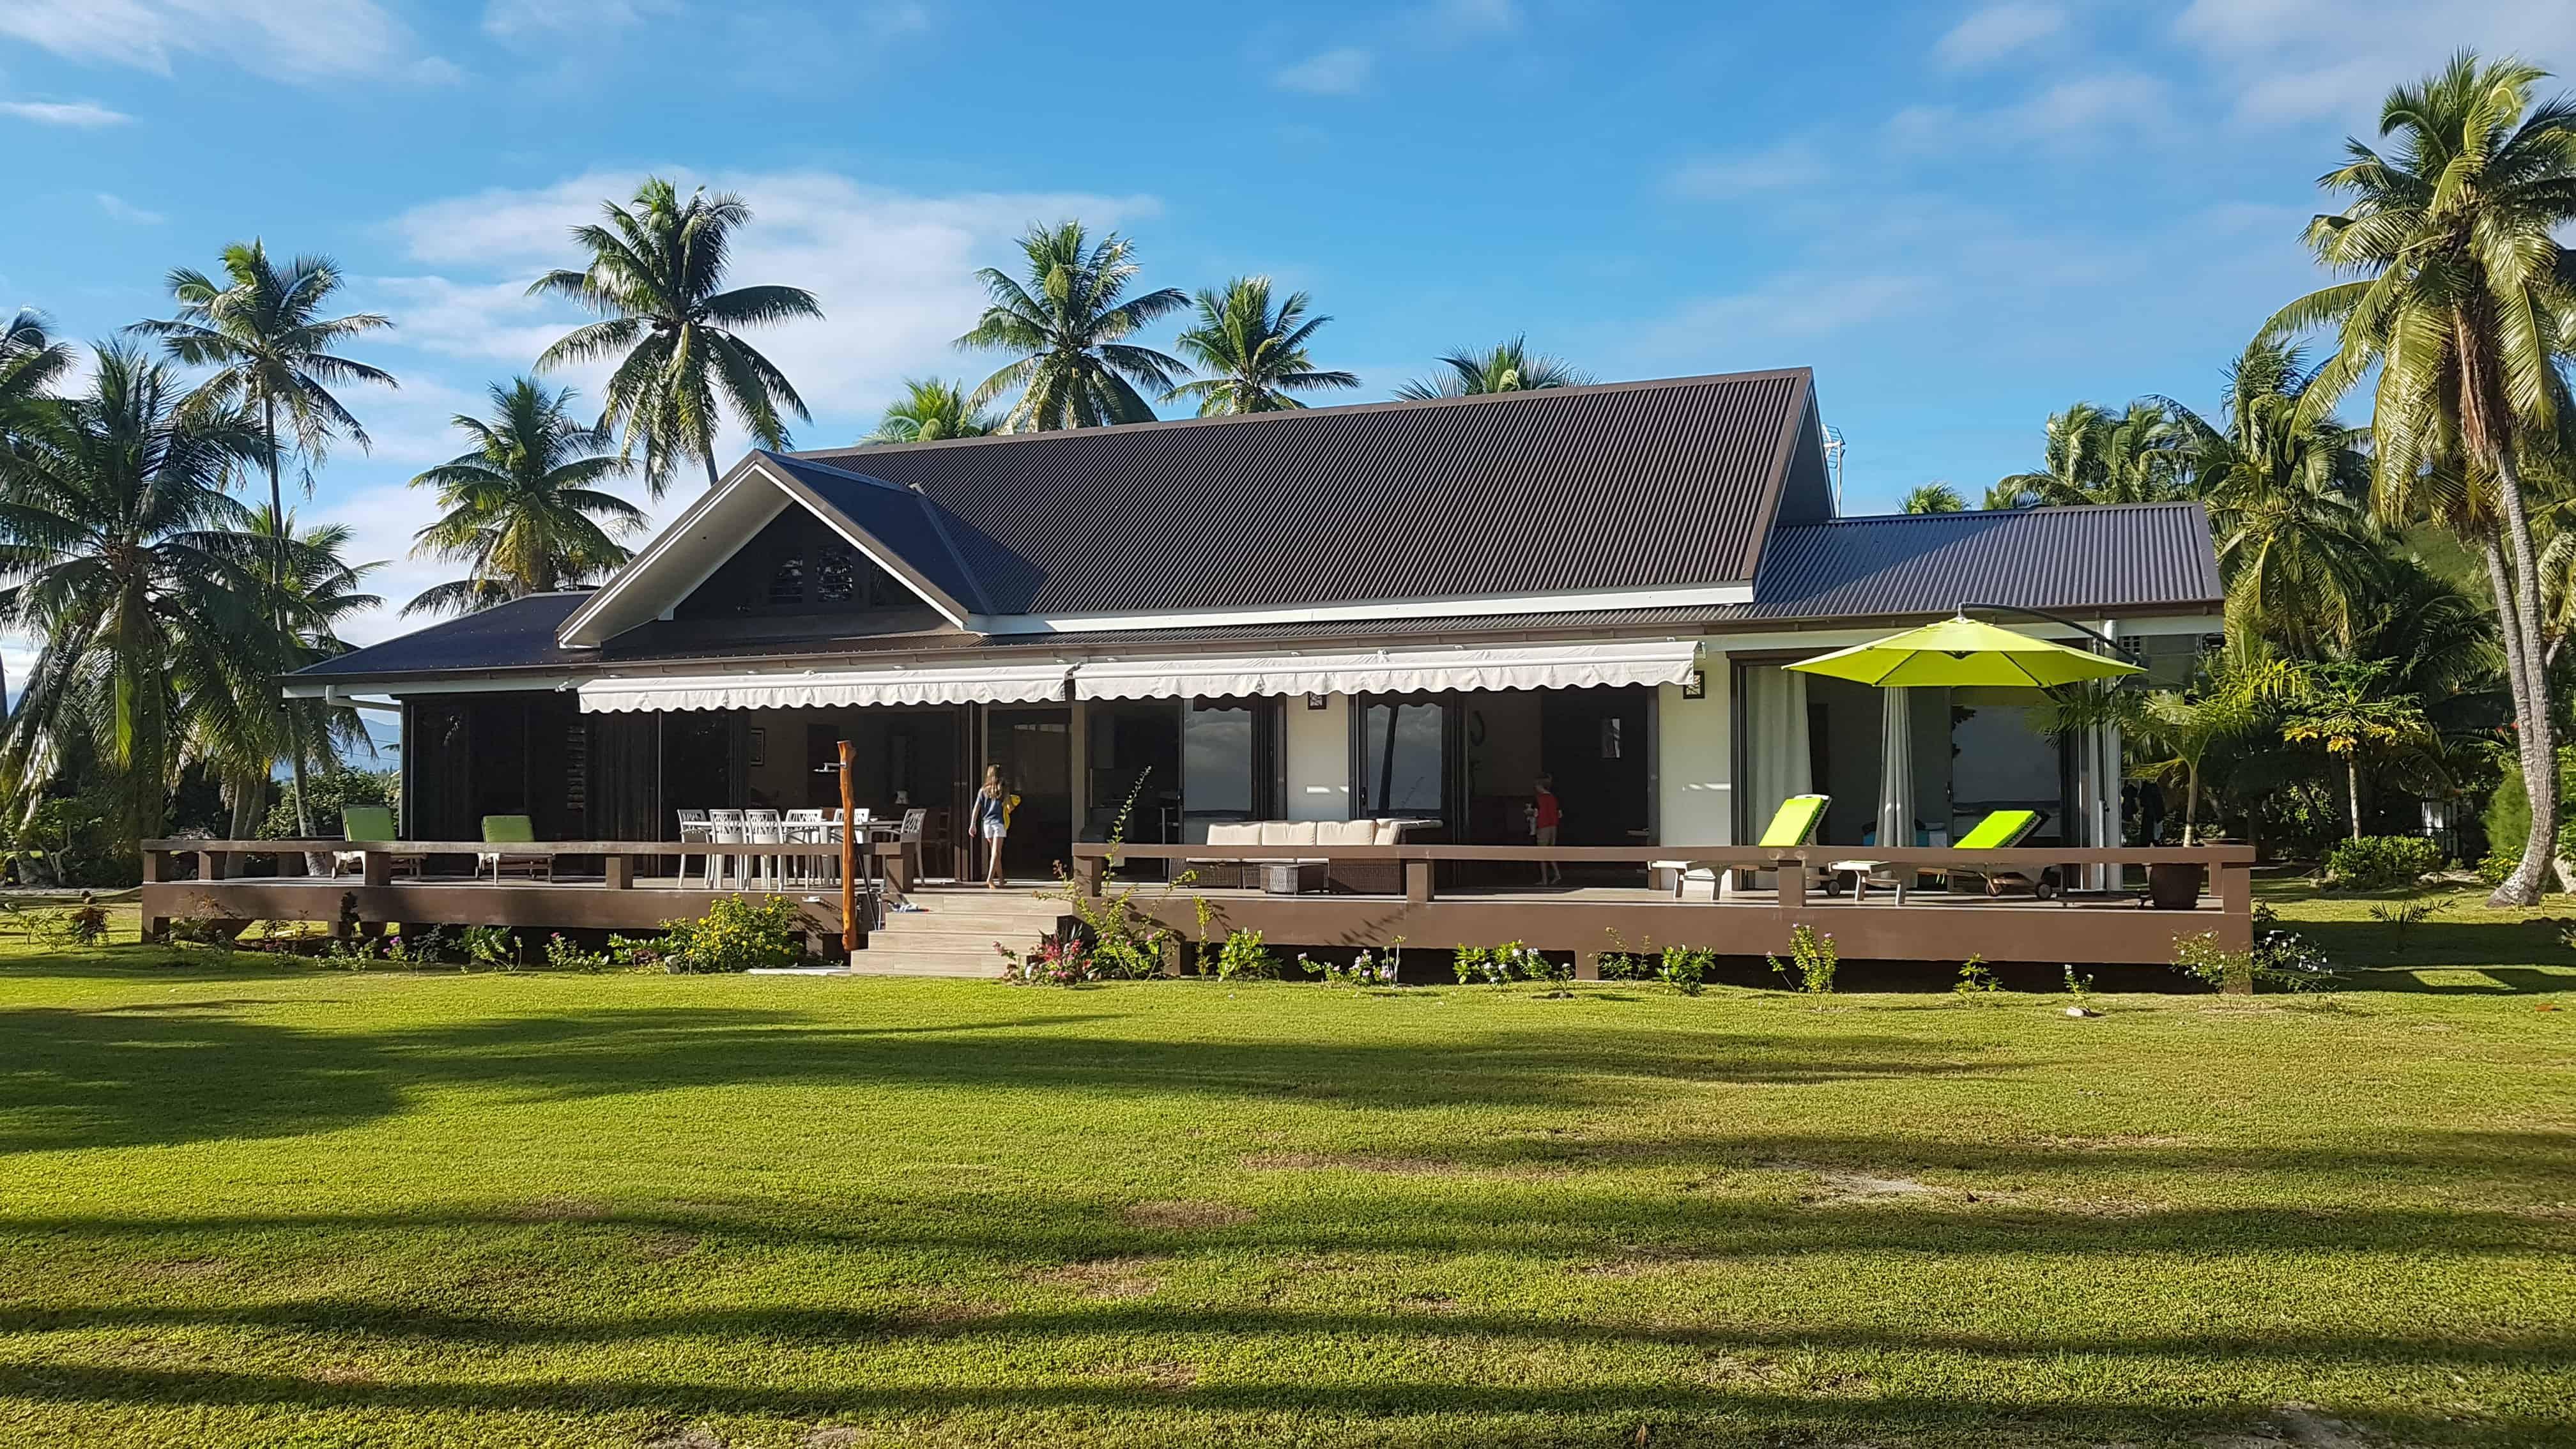 https://tahititourisme.com.au/wp-content/uploads/2018/09/Villa-Tiarenui-by-Tahiti-Homes-®-a-Moorea-4.jpg